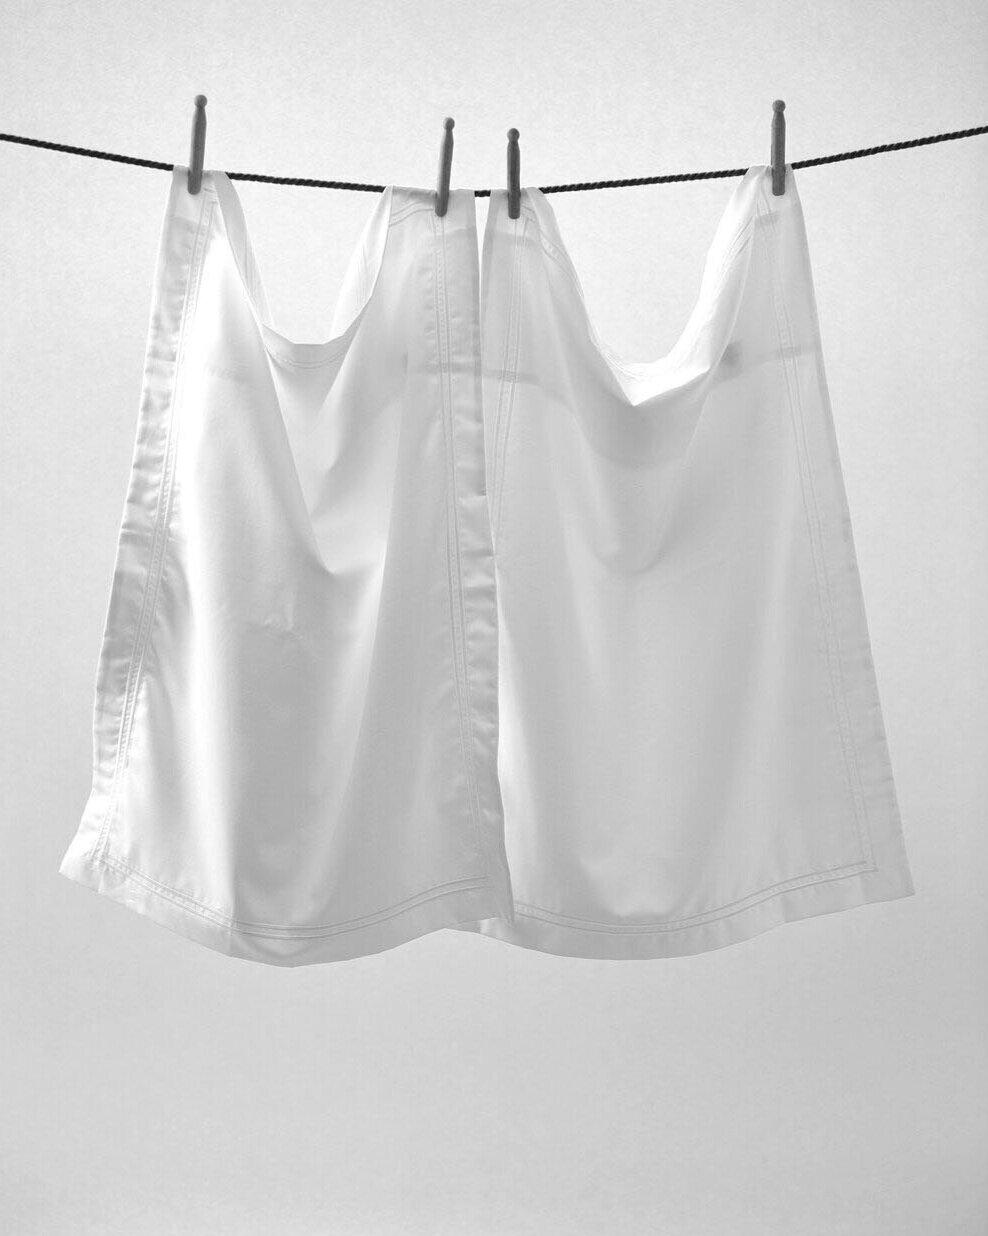 Blanche-Rose-Pillow-Cases-02.jpg